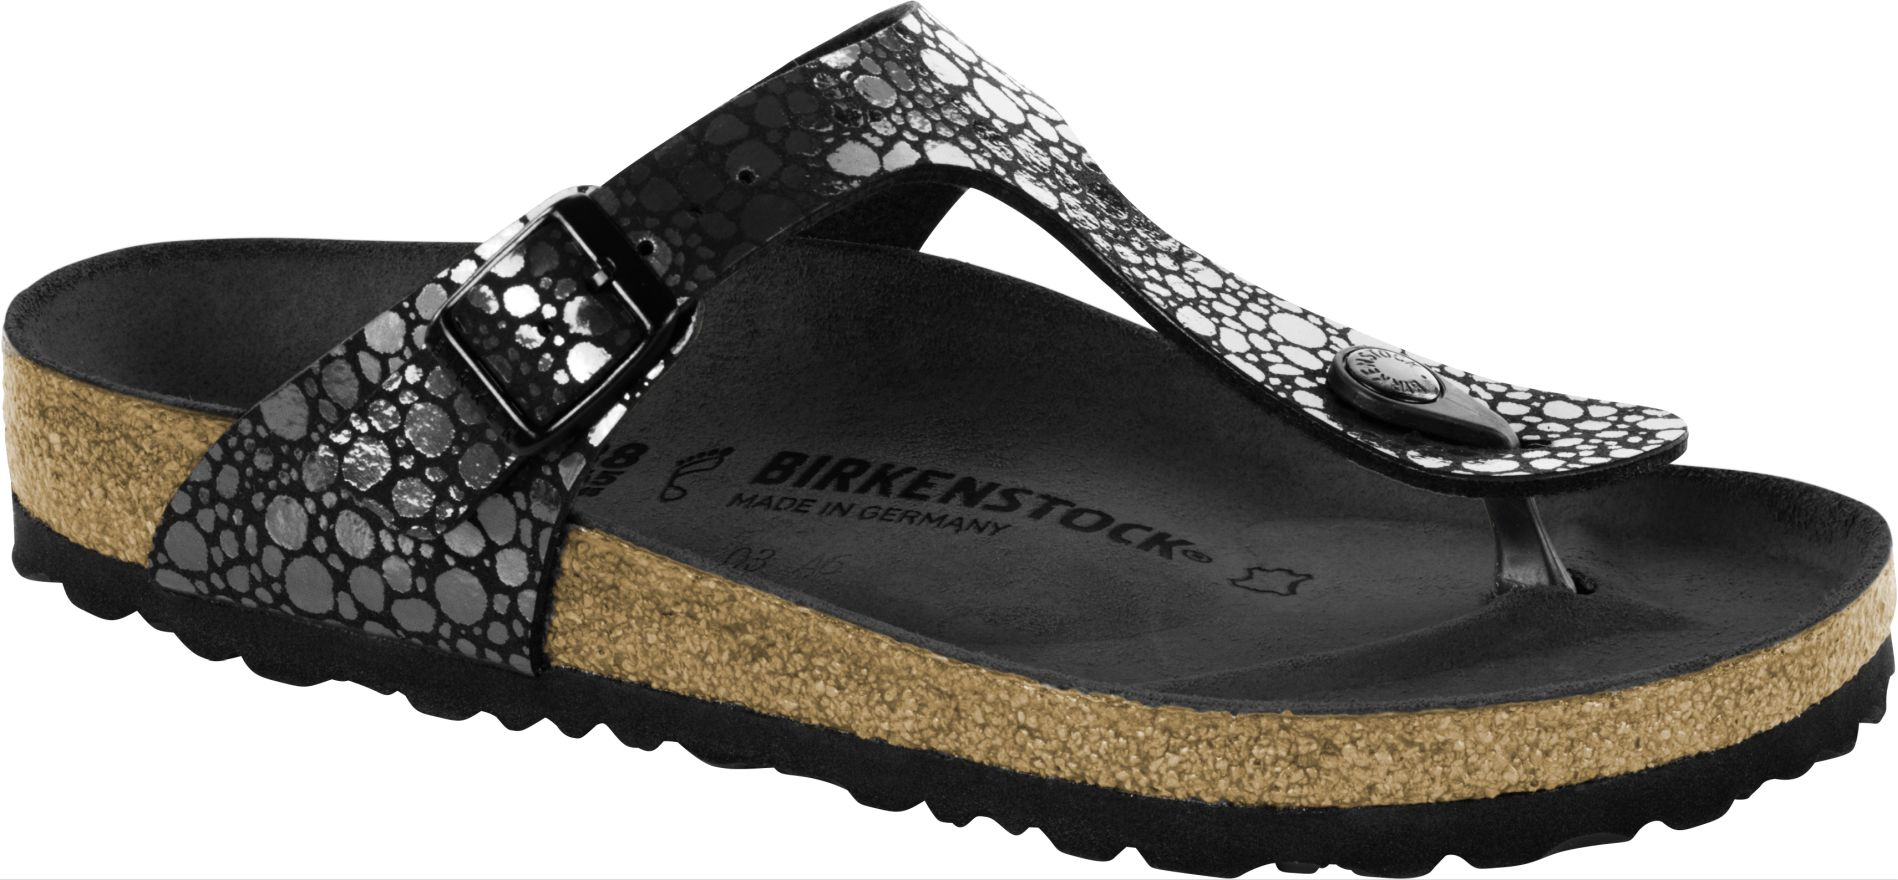 birkenstock gizeh metallic stones black schuhshop24. Black Bedroom Furniture Sets. Home Design Ideas